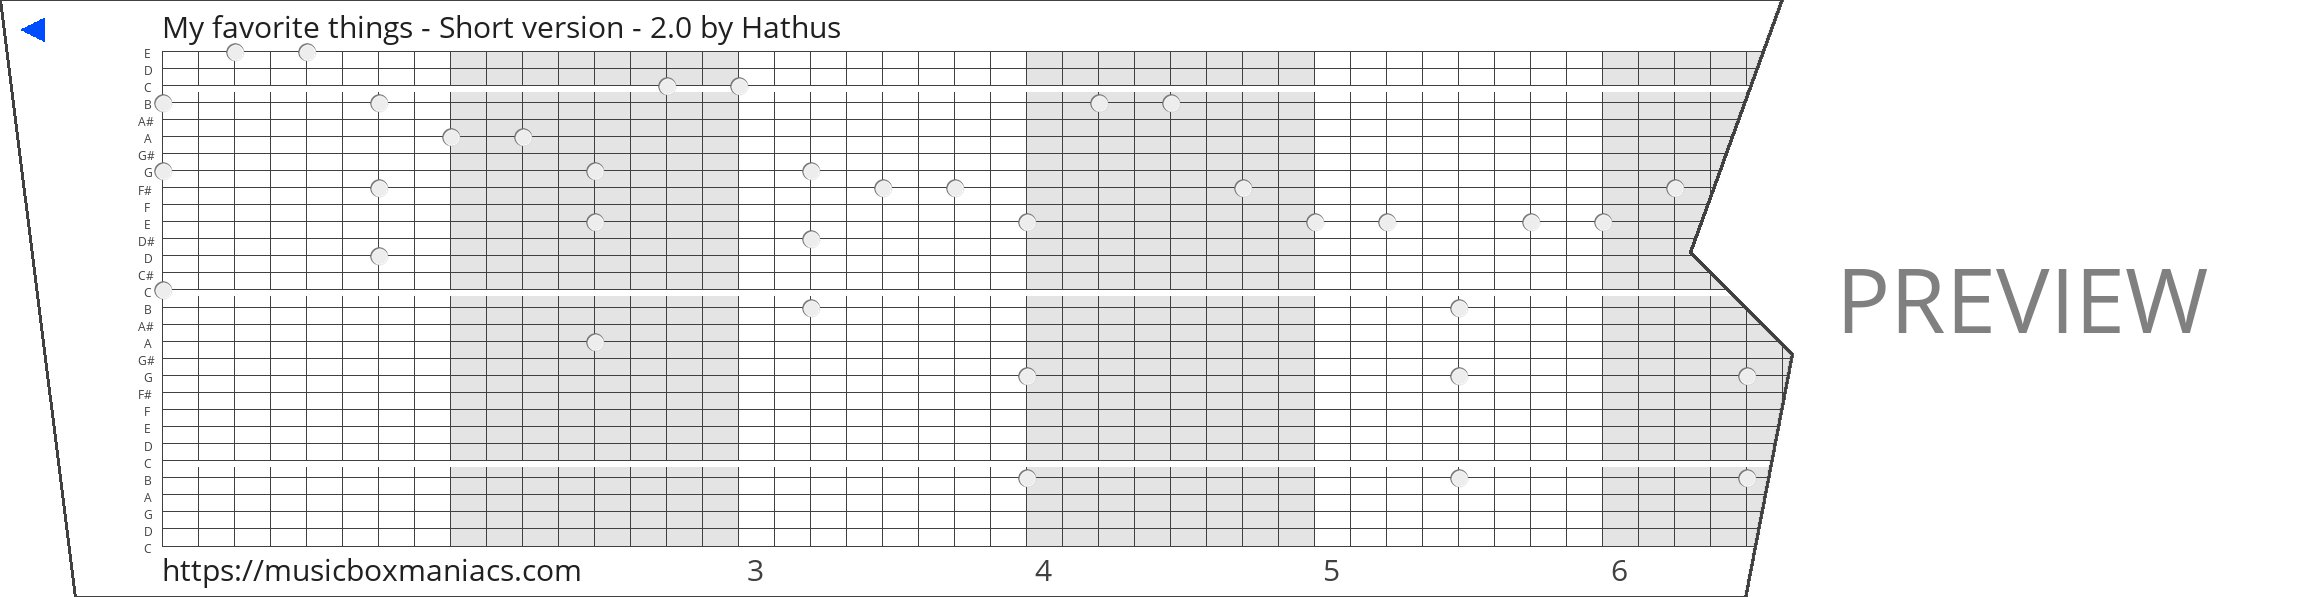 My favorite things - Short version - 2.0 30 note music box paper strip